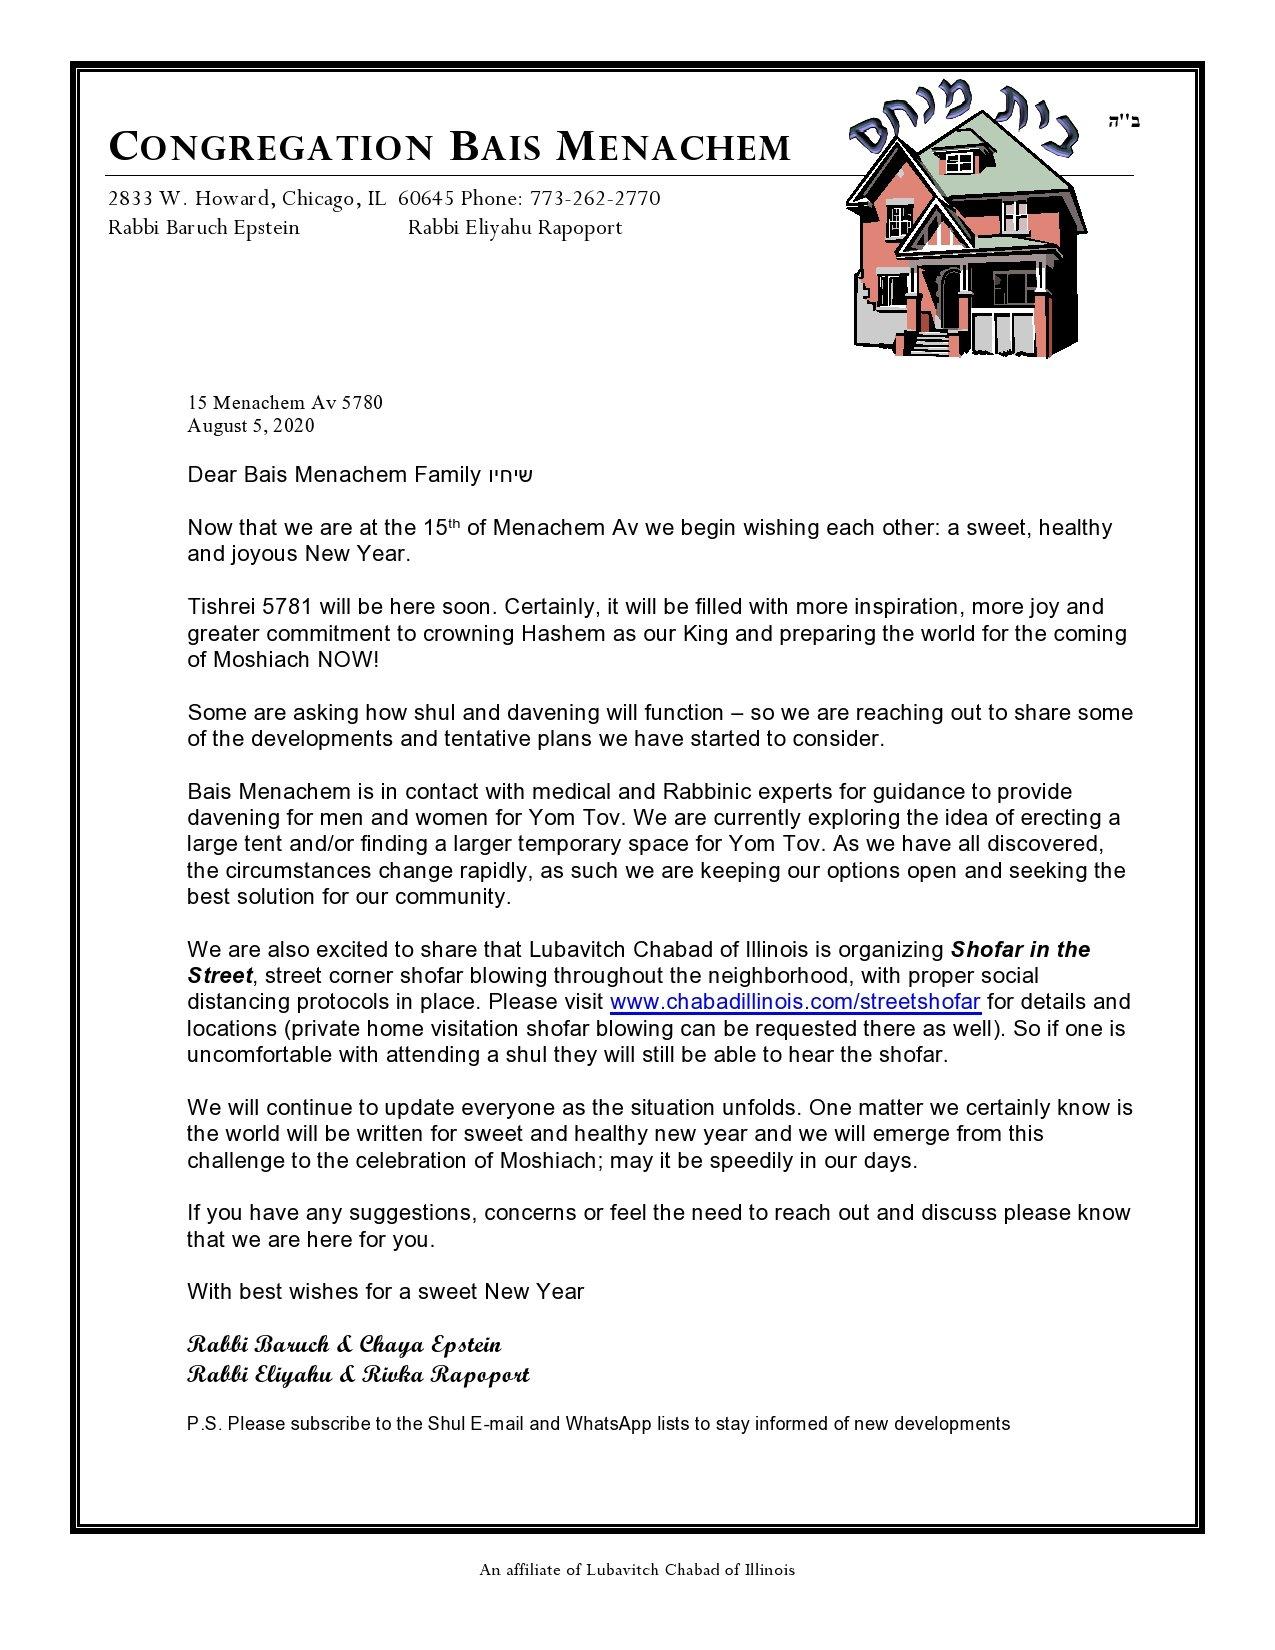 Tishrei Letter-page0001.jpg